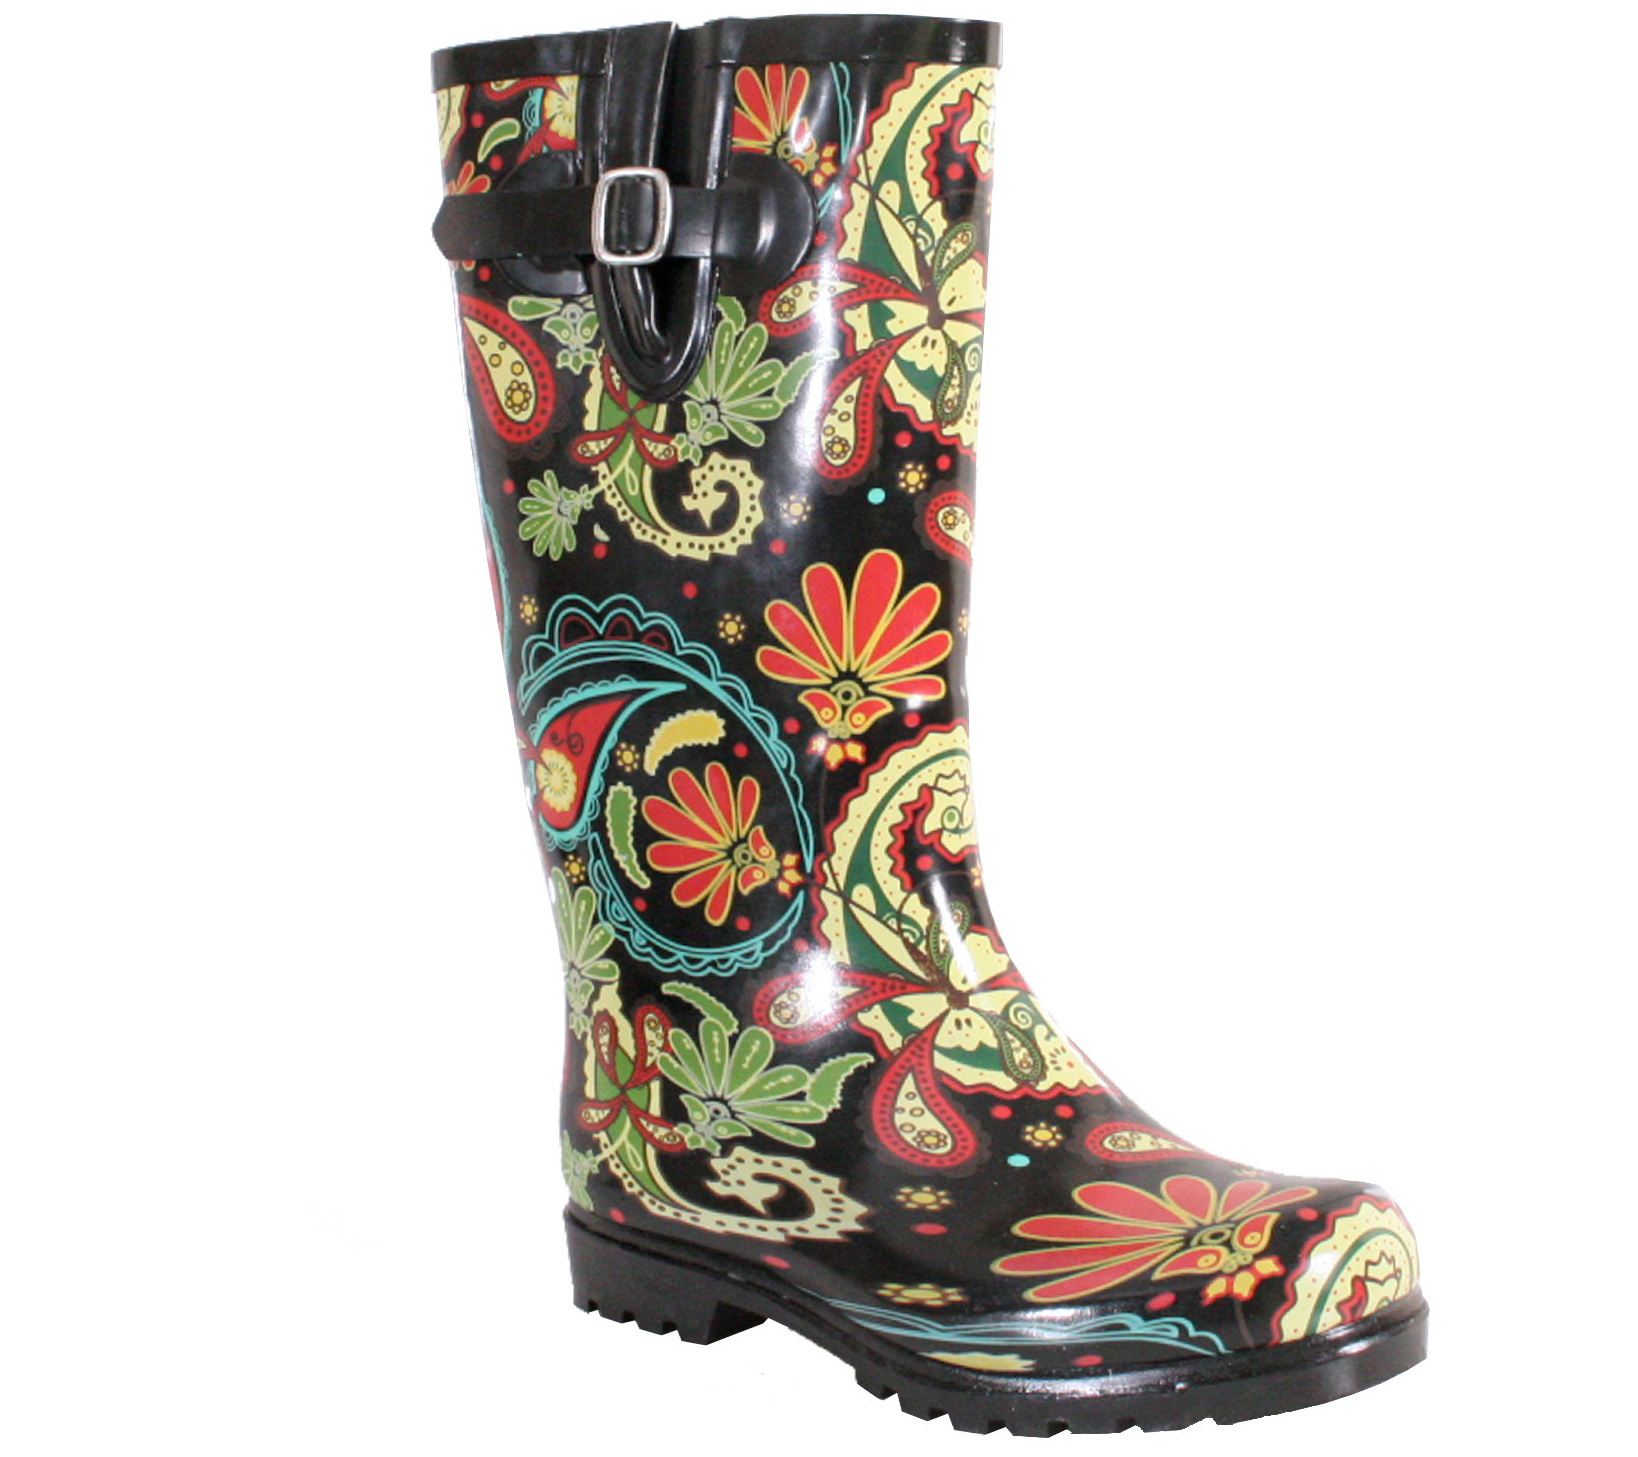 Nomad Rubber Rain Boots - Puddles Paisley